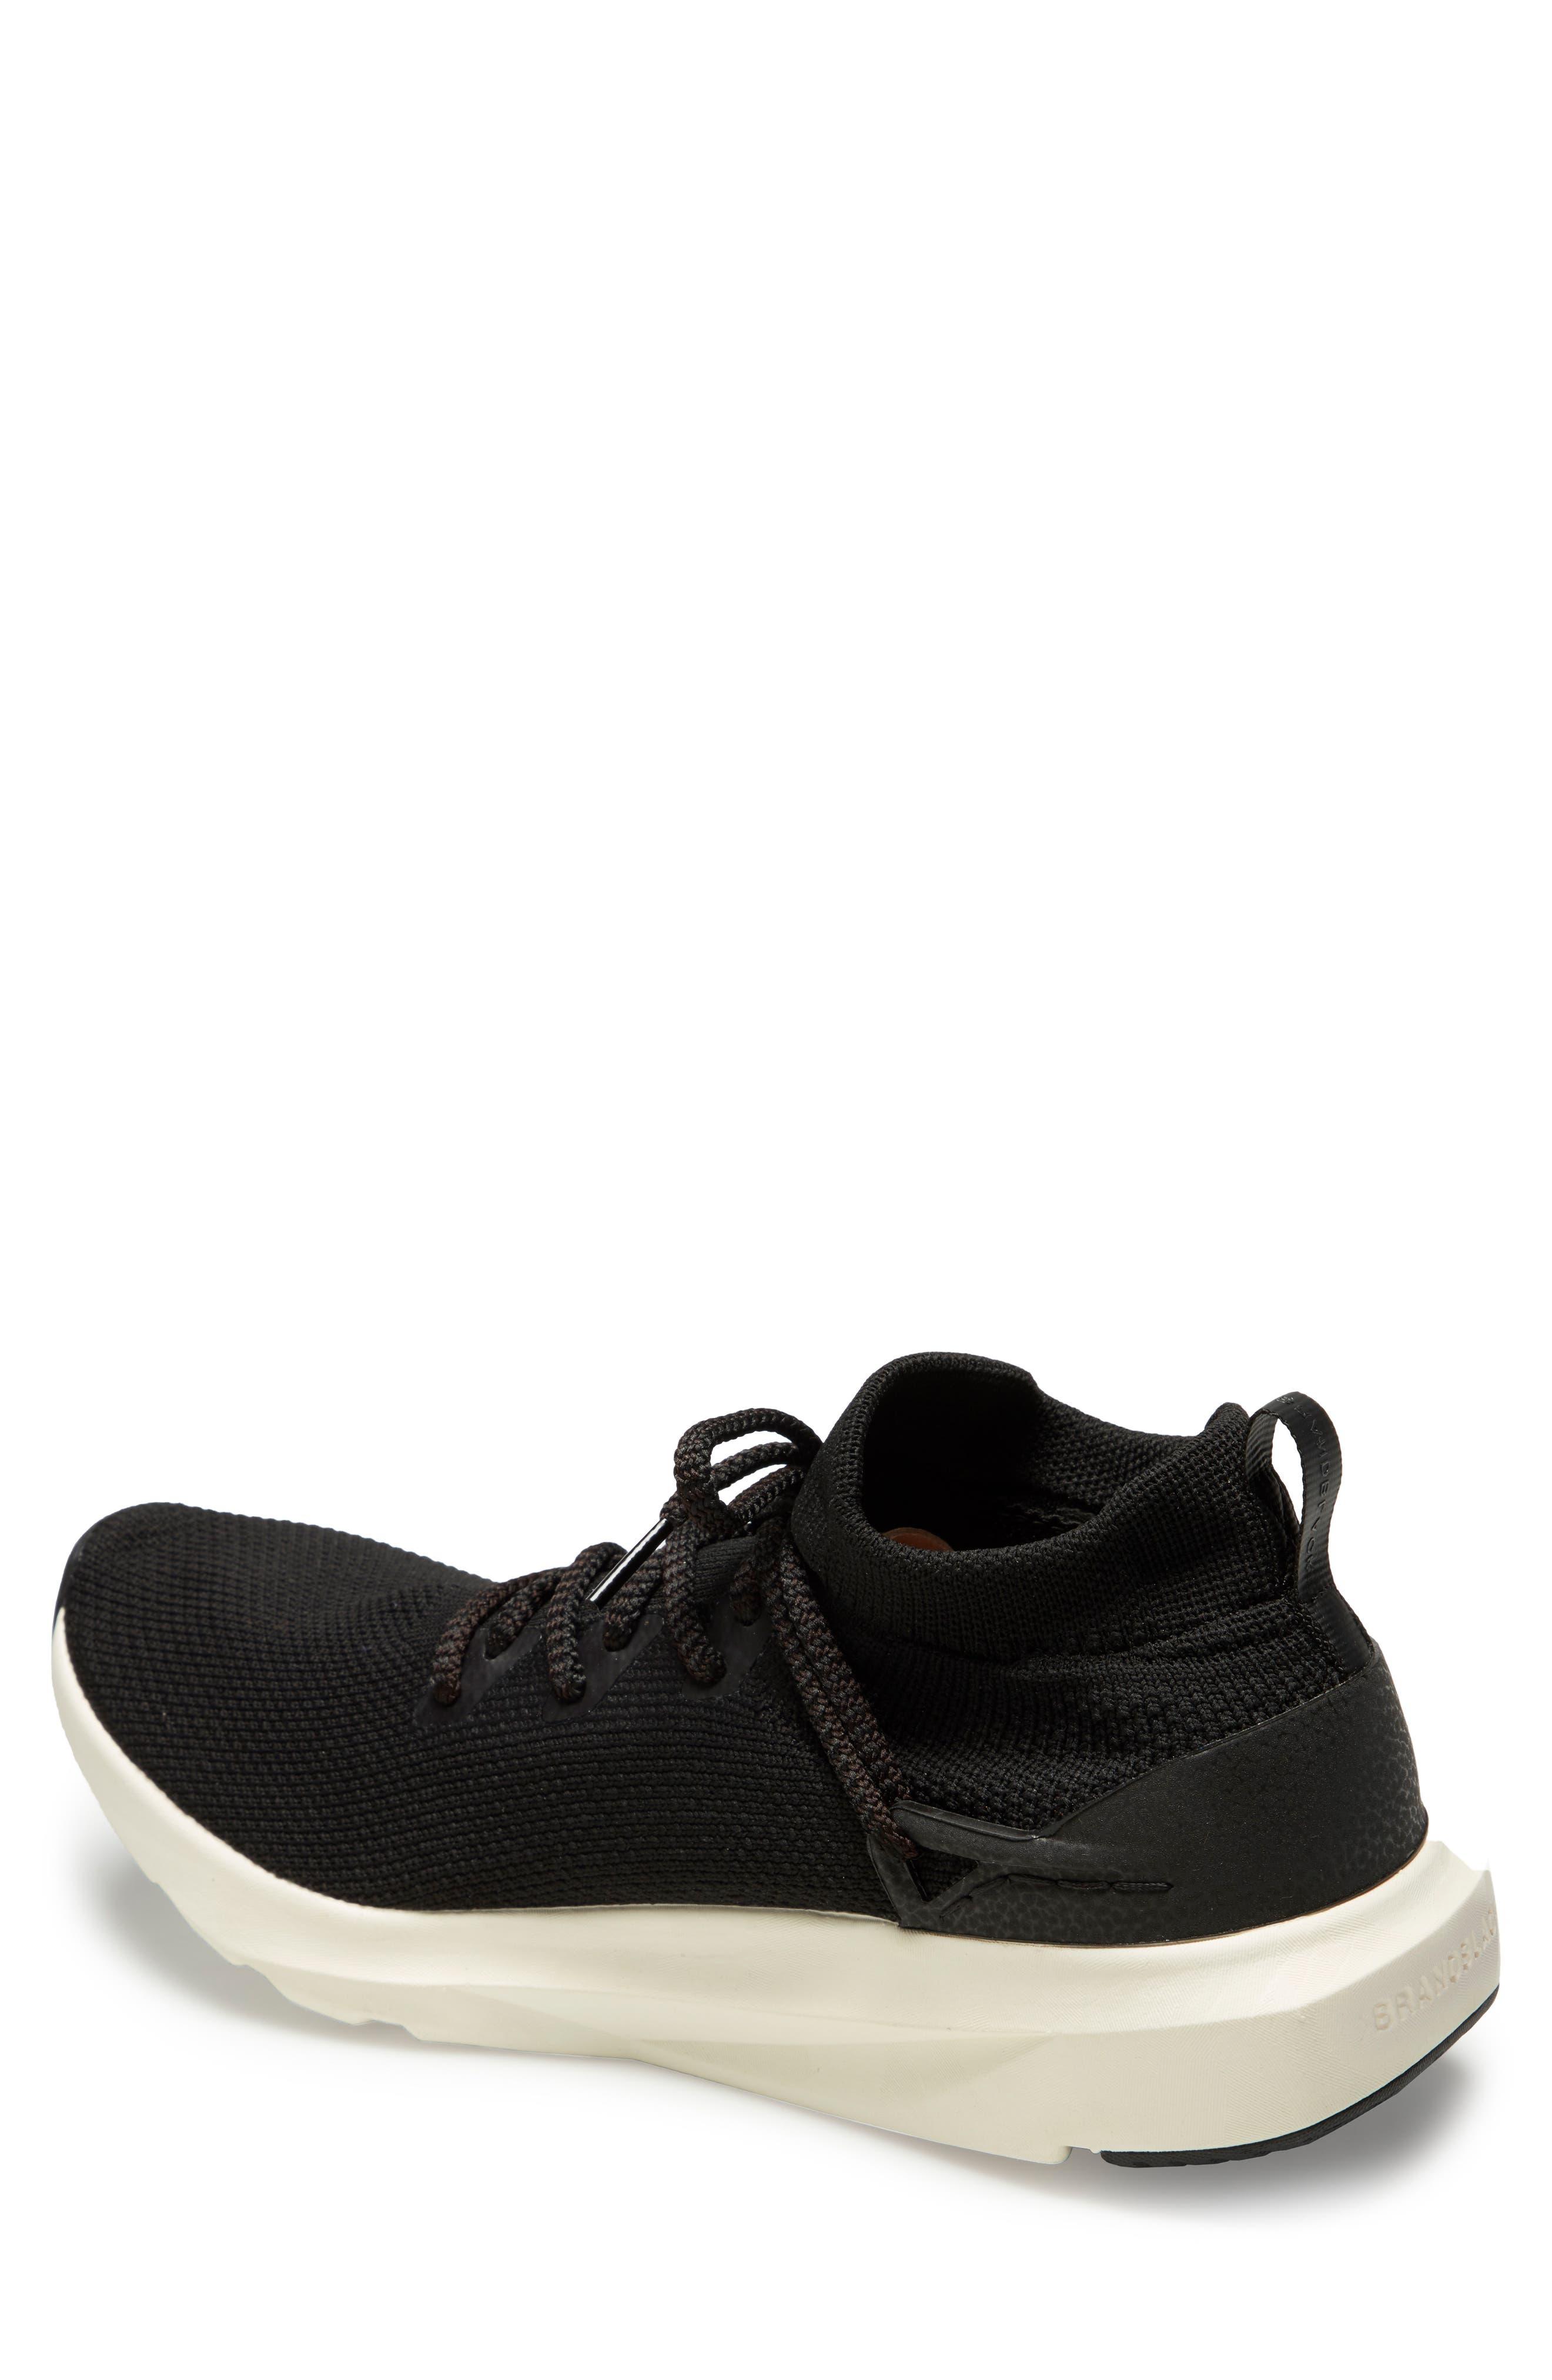 Kaze Sneaker,                             Alternate thumbnail 2, color,                             011